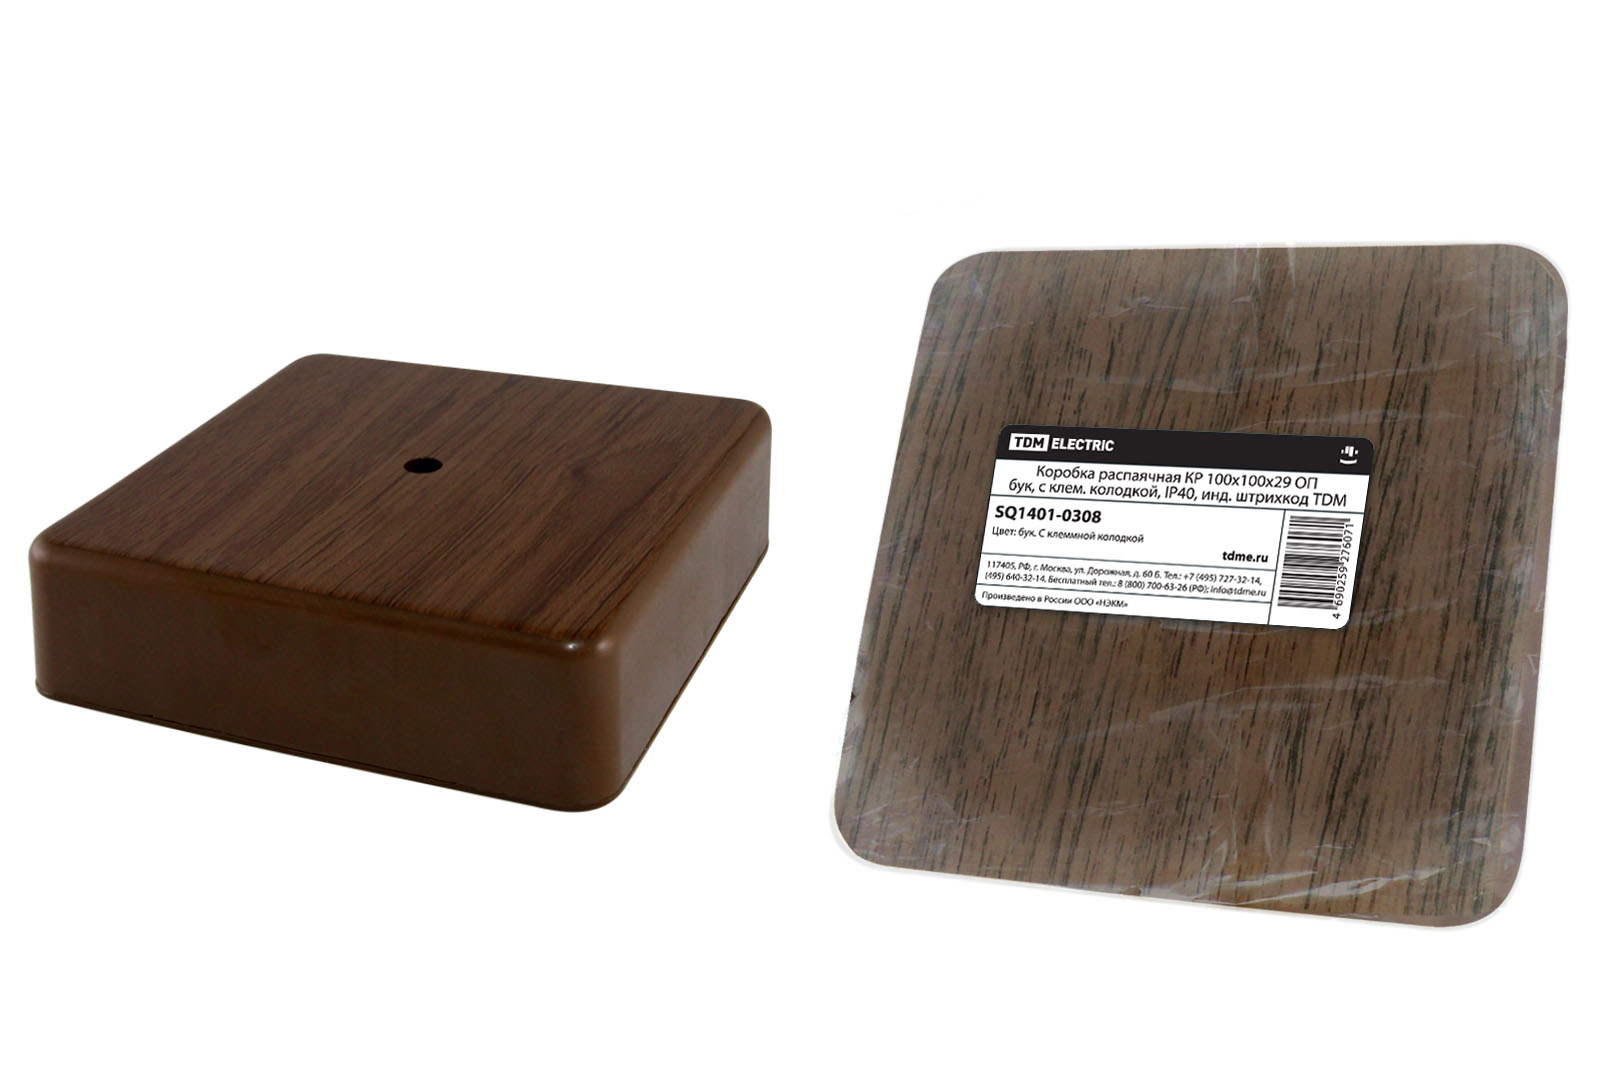 Фото Коробка распаячная КР 100х100х29 ОП бук, с клем. колодкой, IP40, инд. штрихкод TDM {SQ1401-0308}